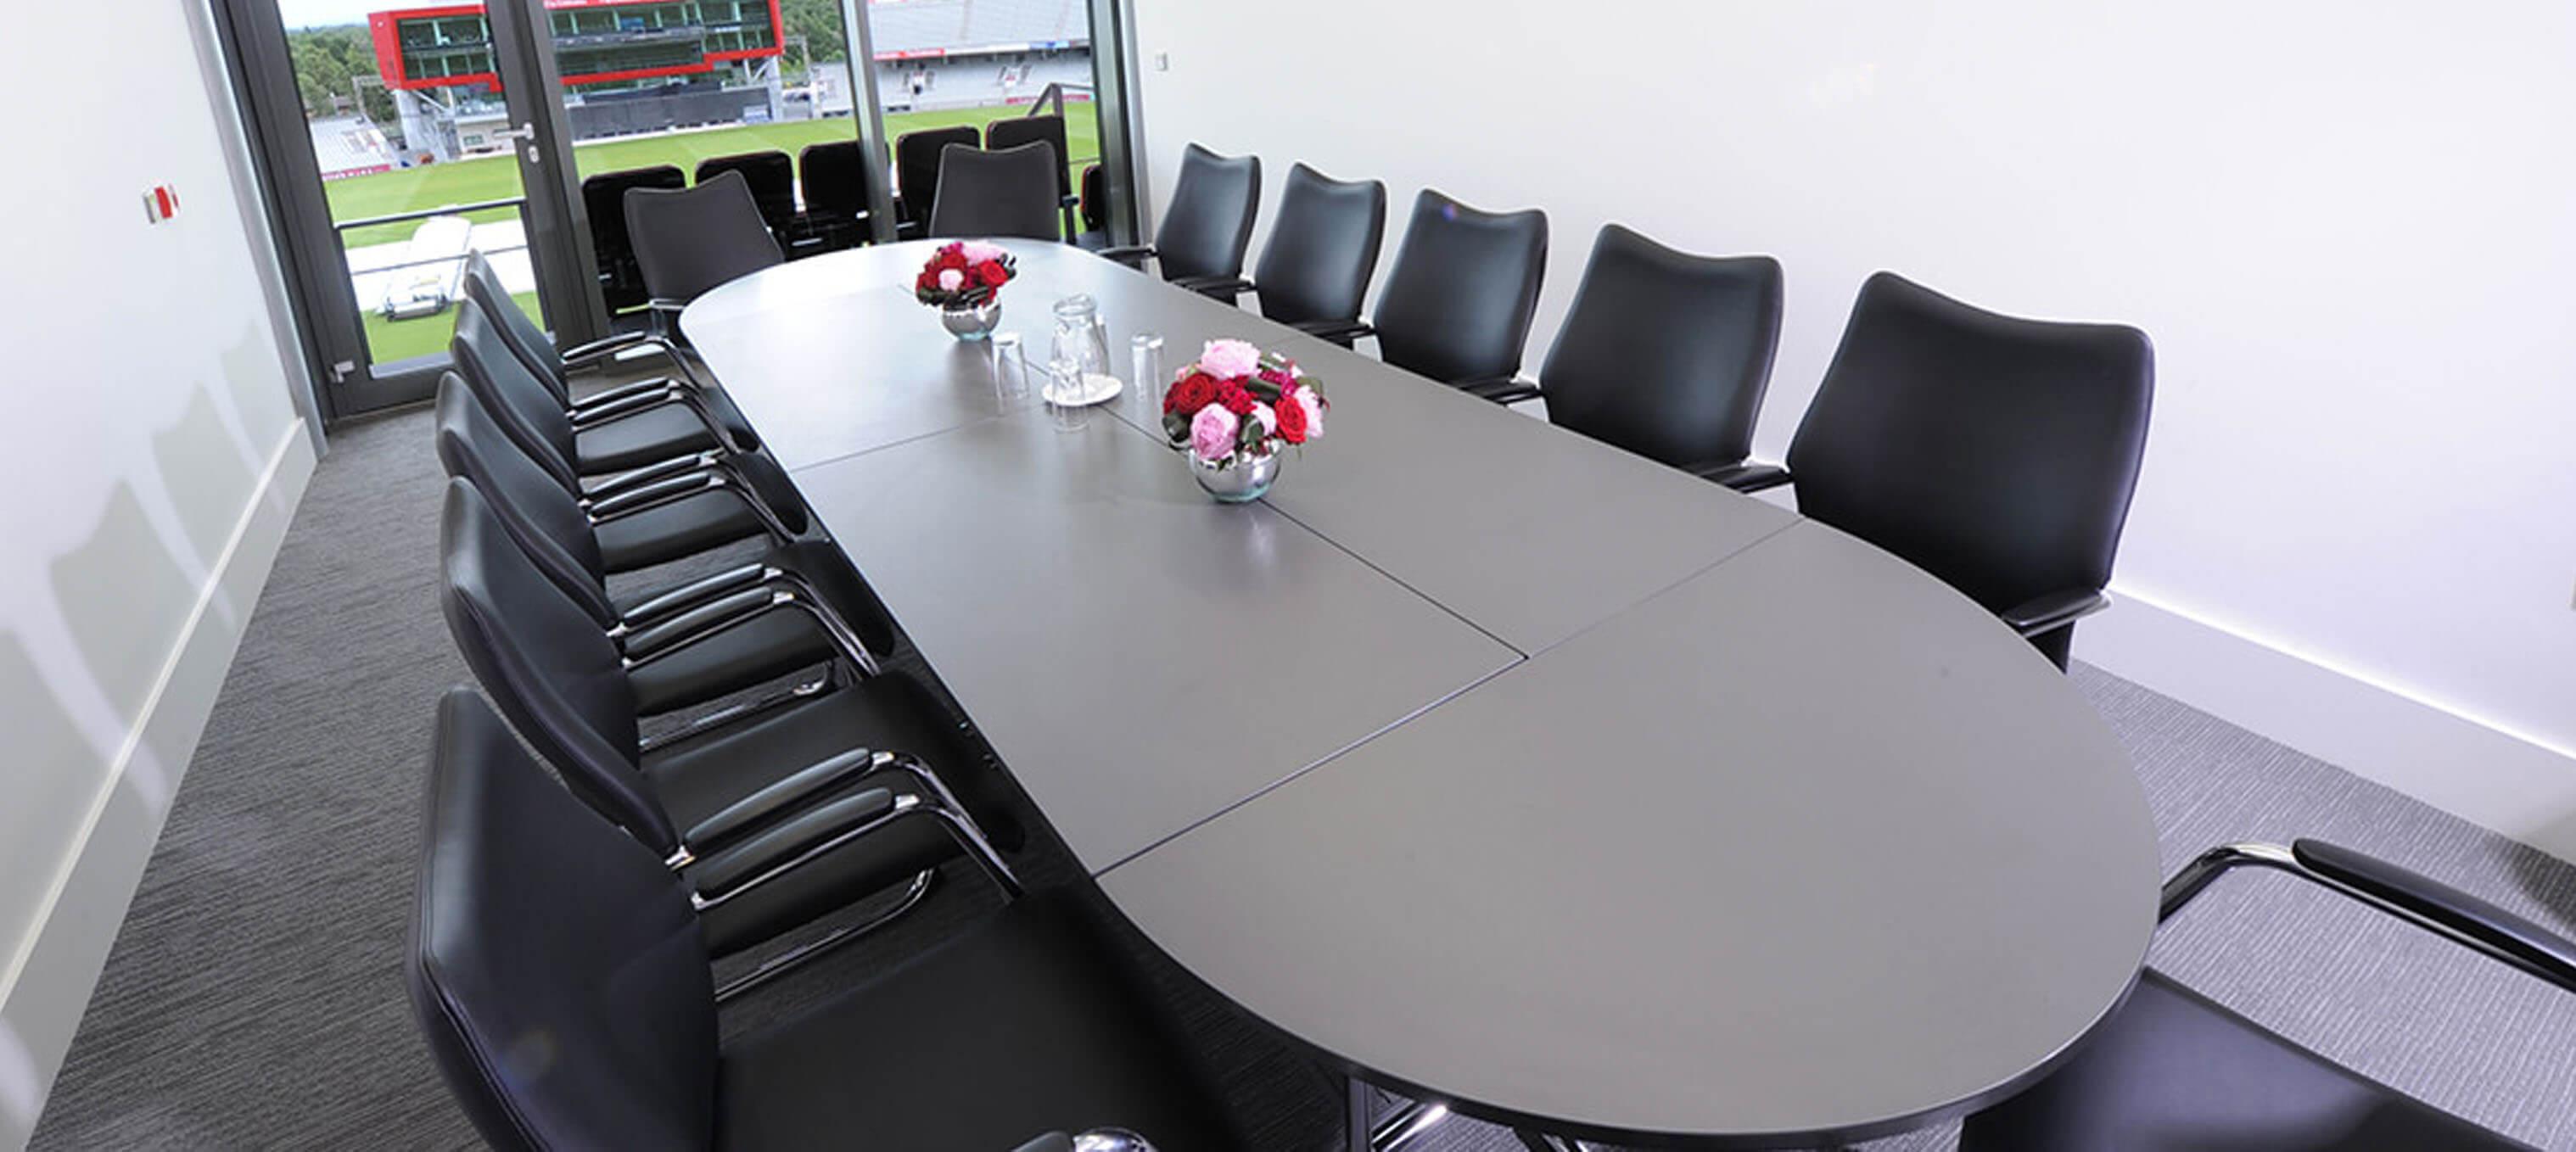 Forum Board Room Chairs  Hero 2